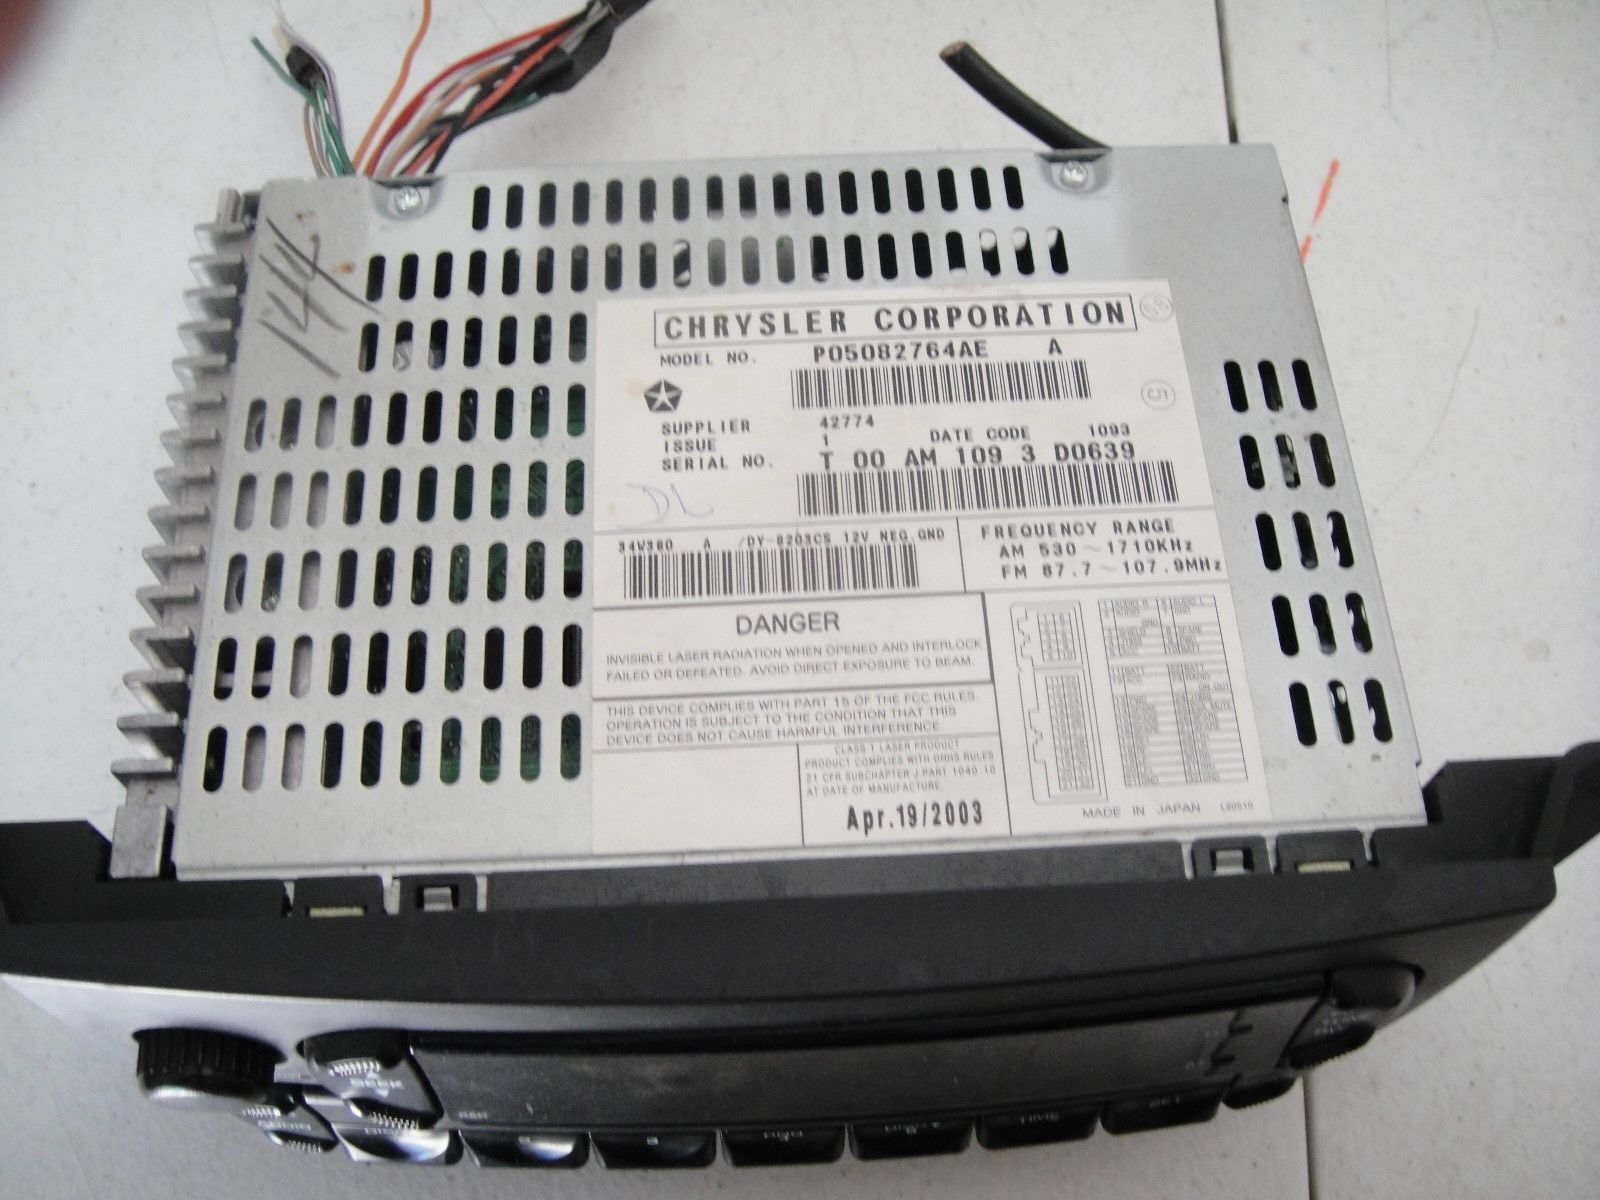 04 05 06 07 08 Chrysler Pacifica Radio Cd Player P05082764AE image 2